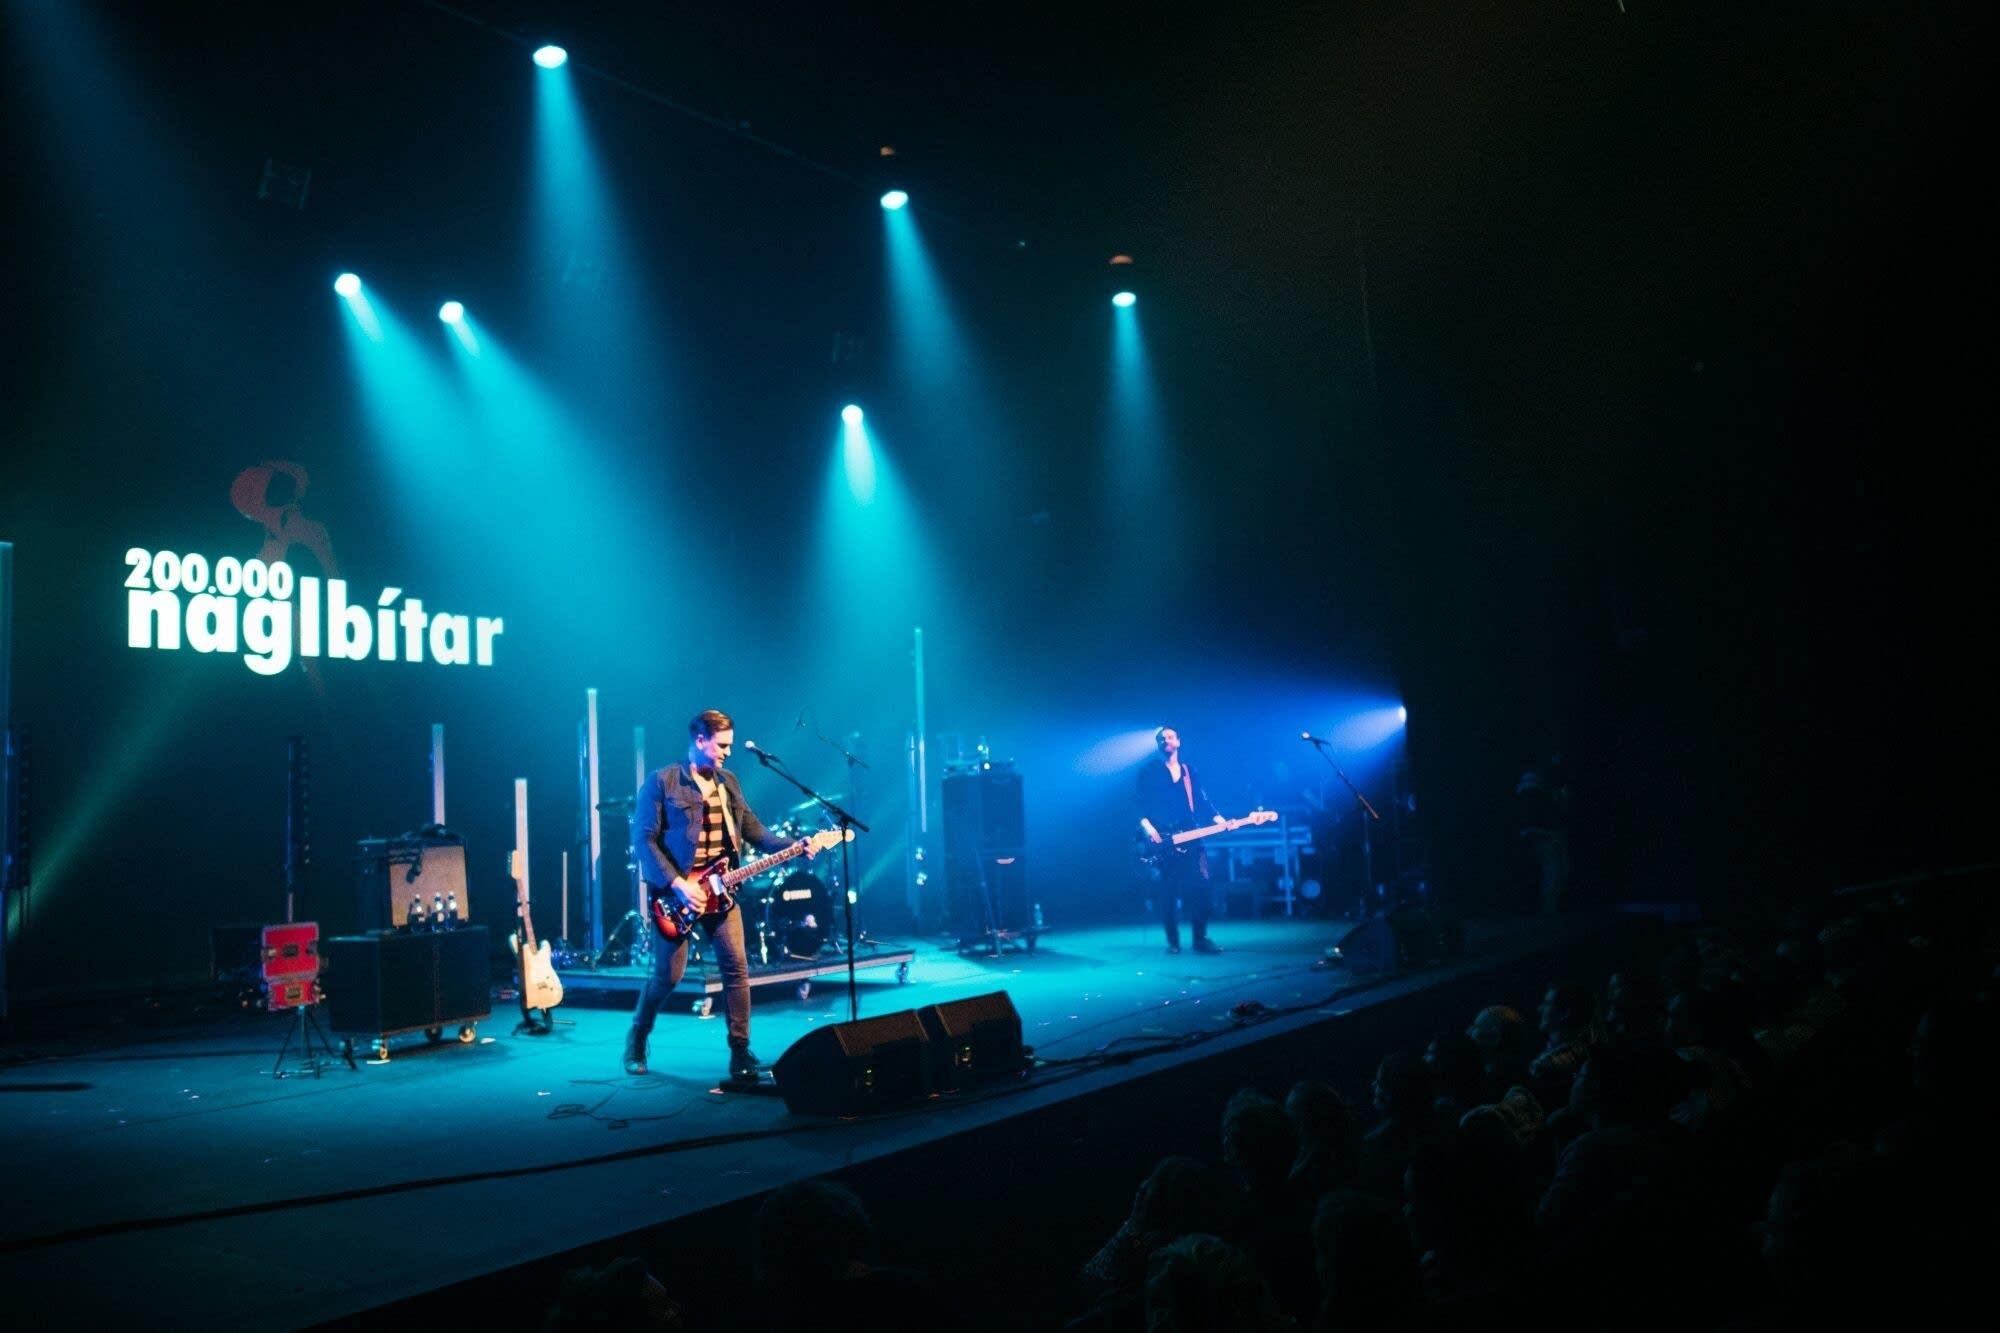 200,000 Naglbitar perform at Hof in Akureyri